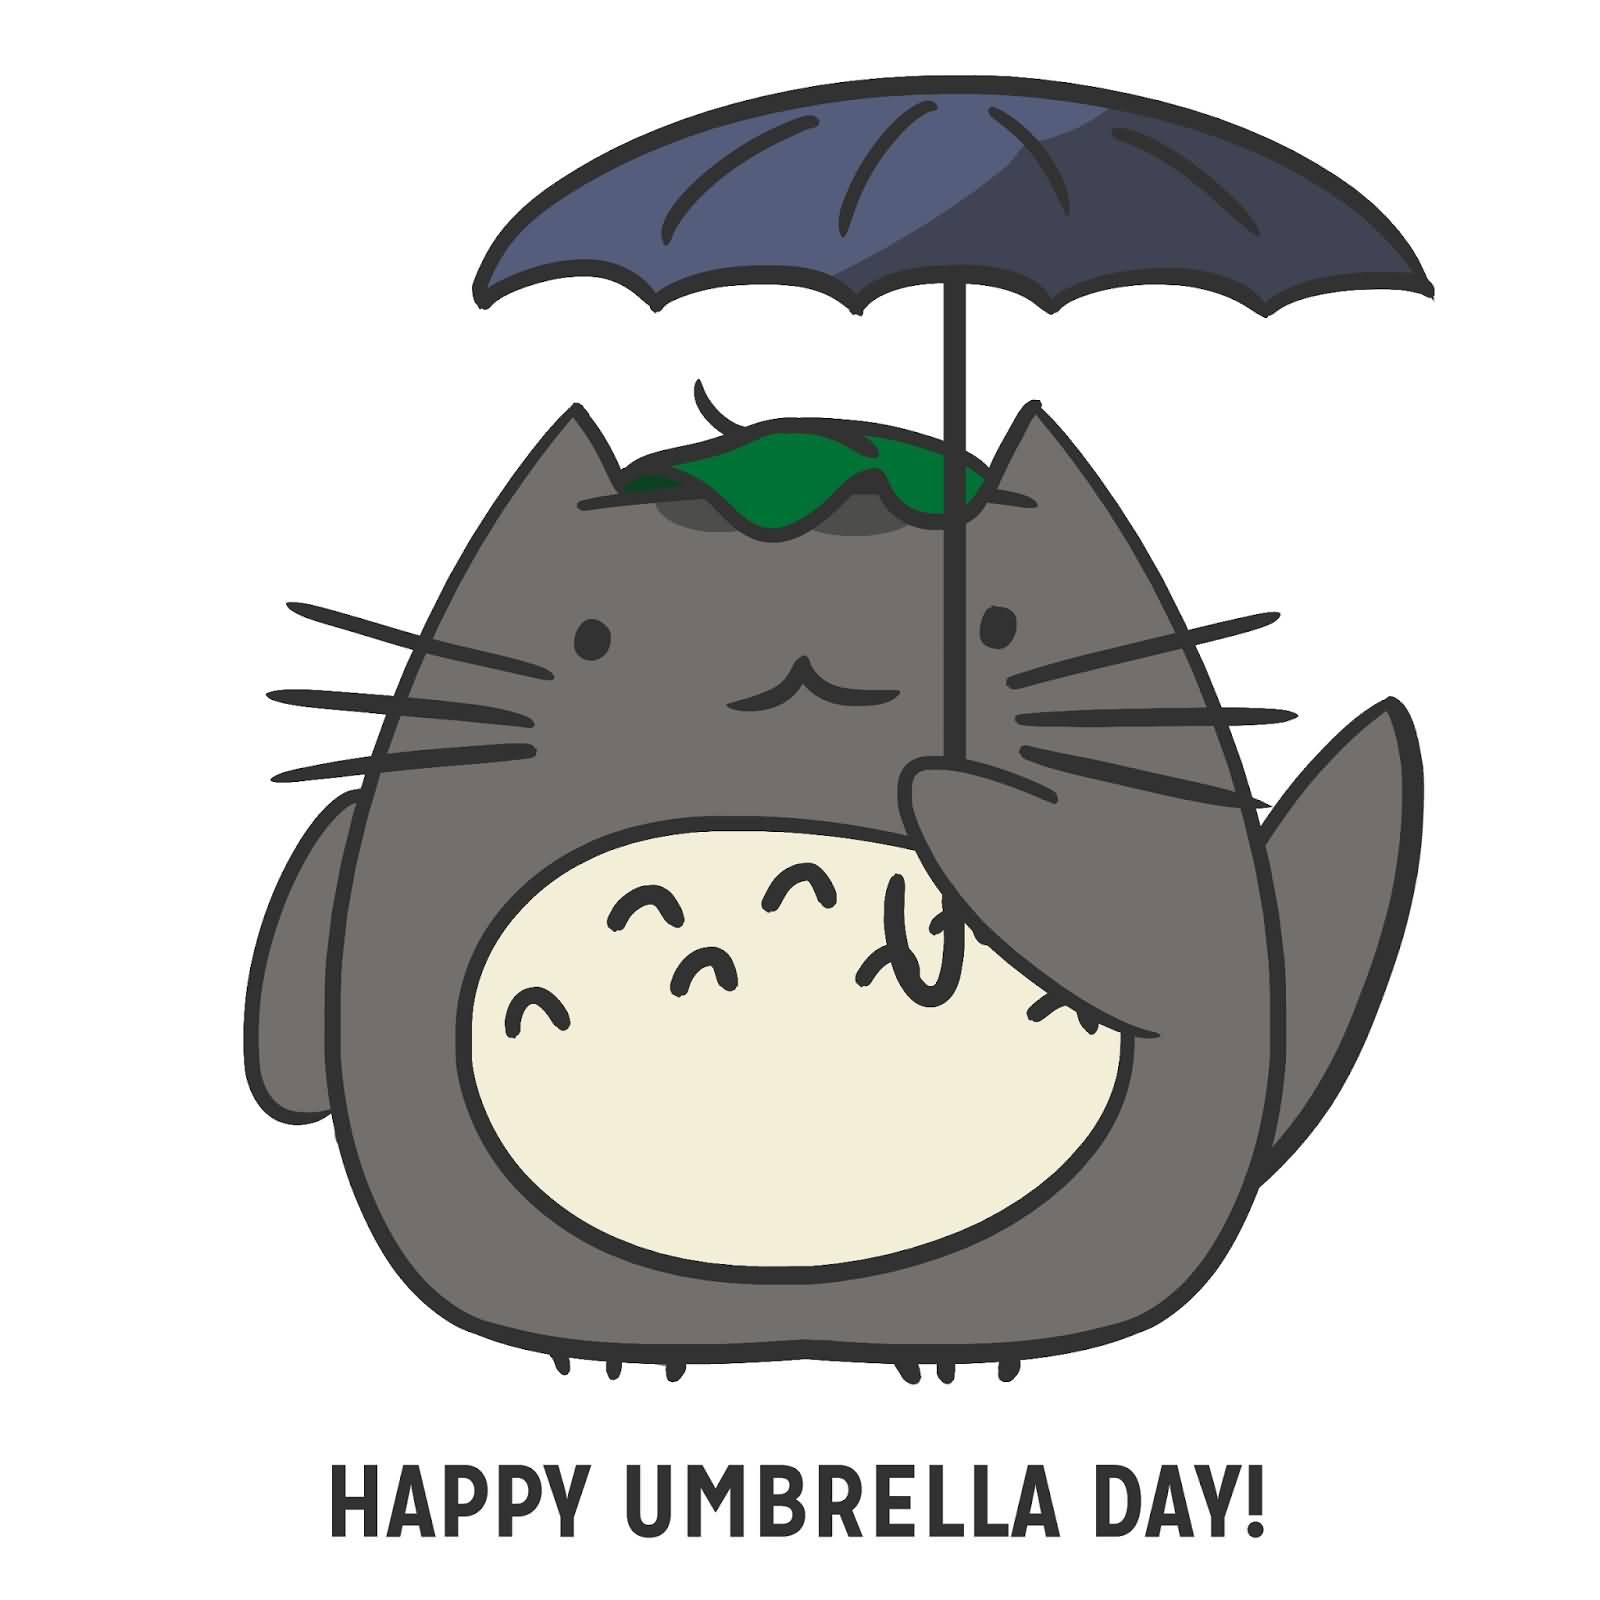 happy umbrella day crocodile with umbrella cartoon picture